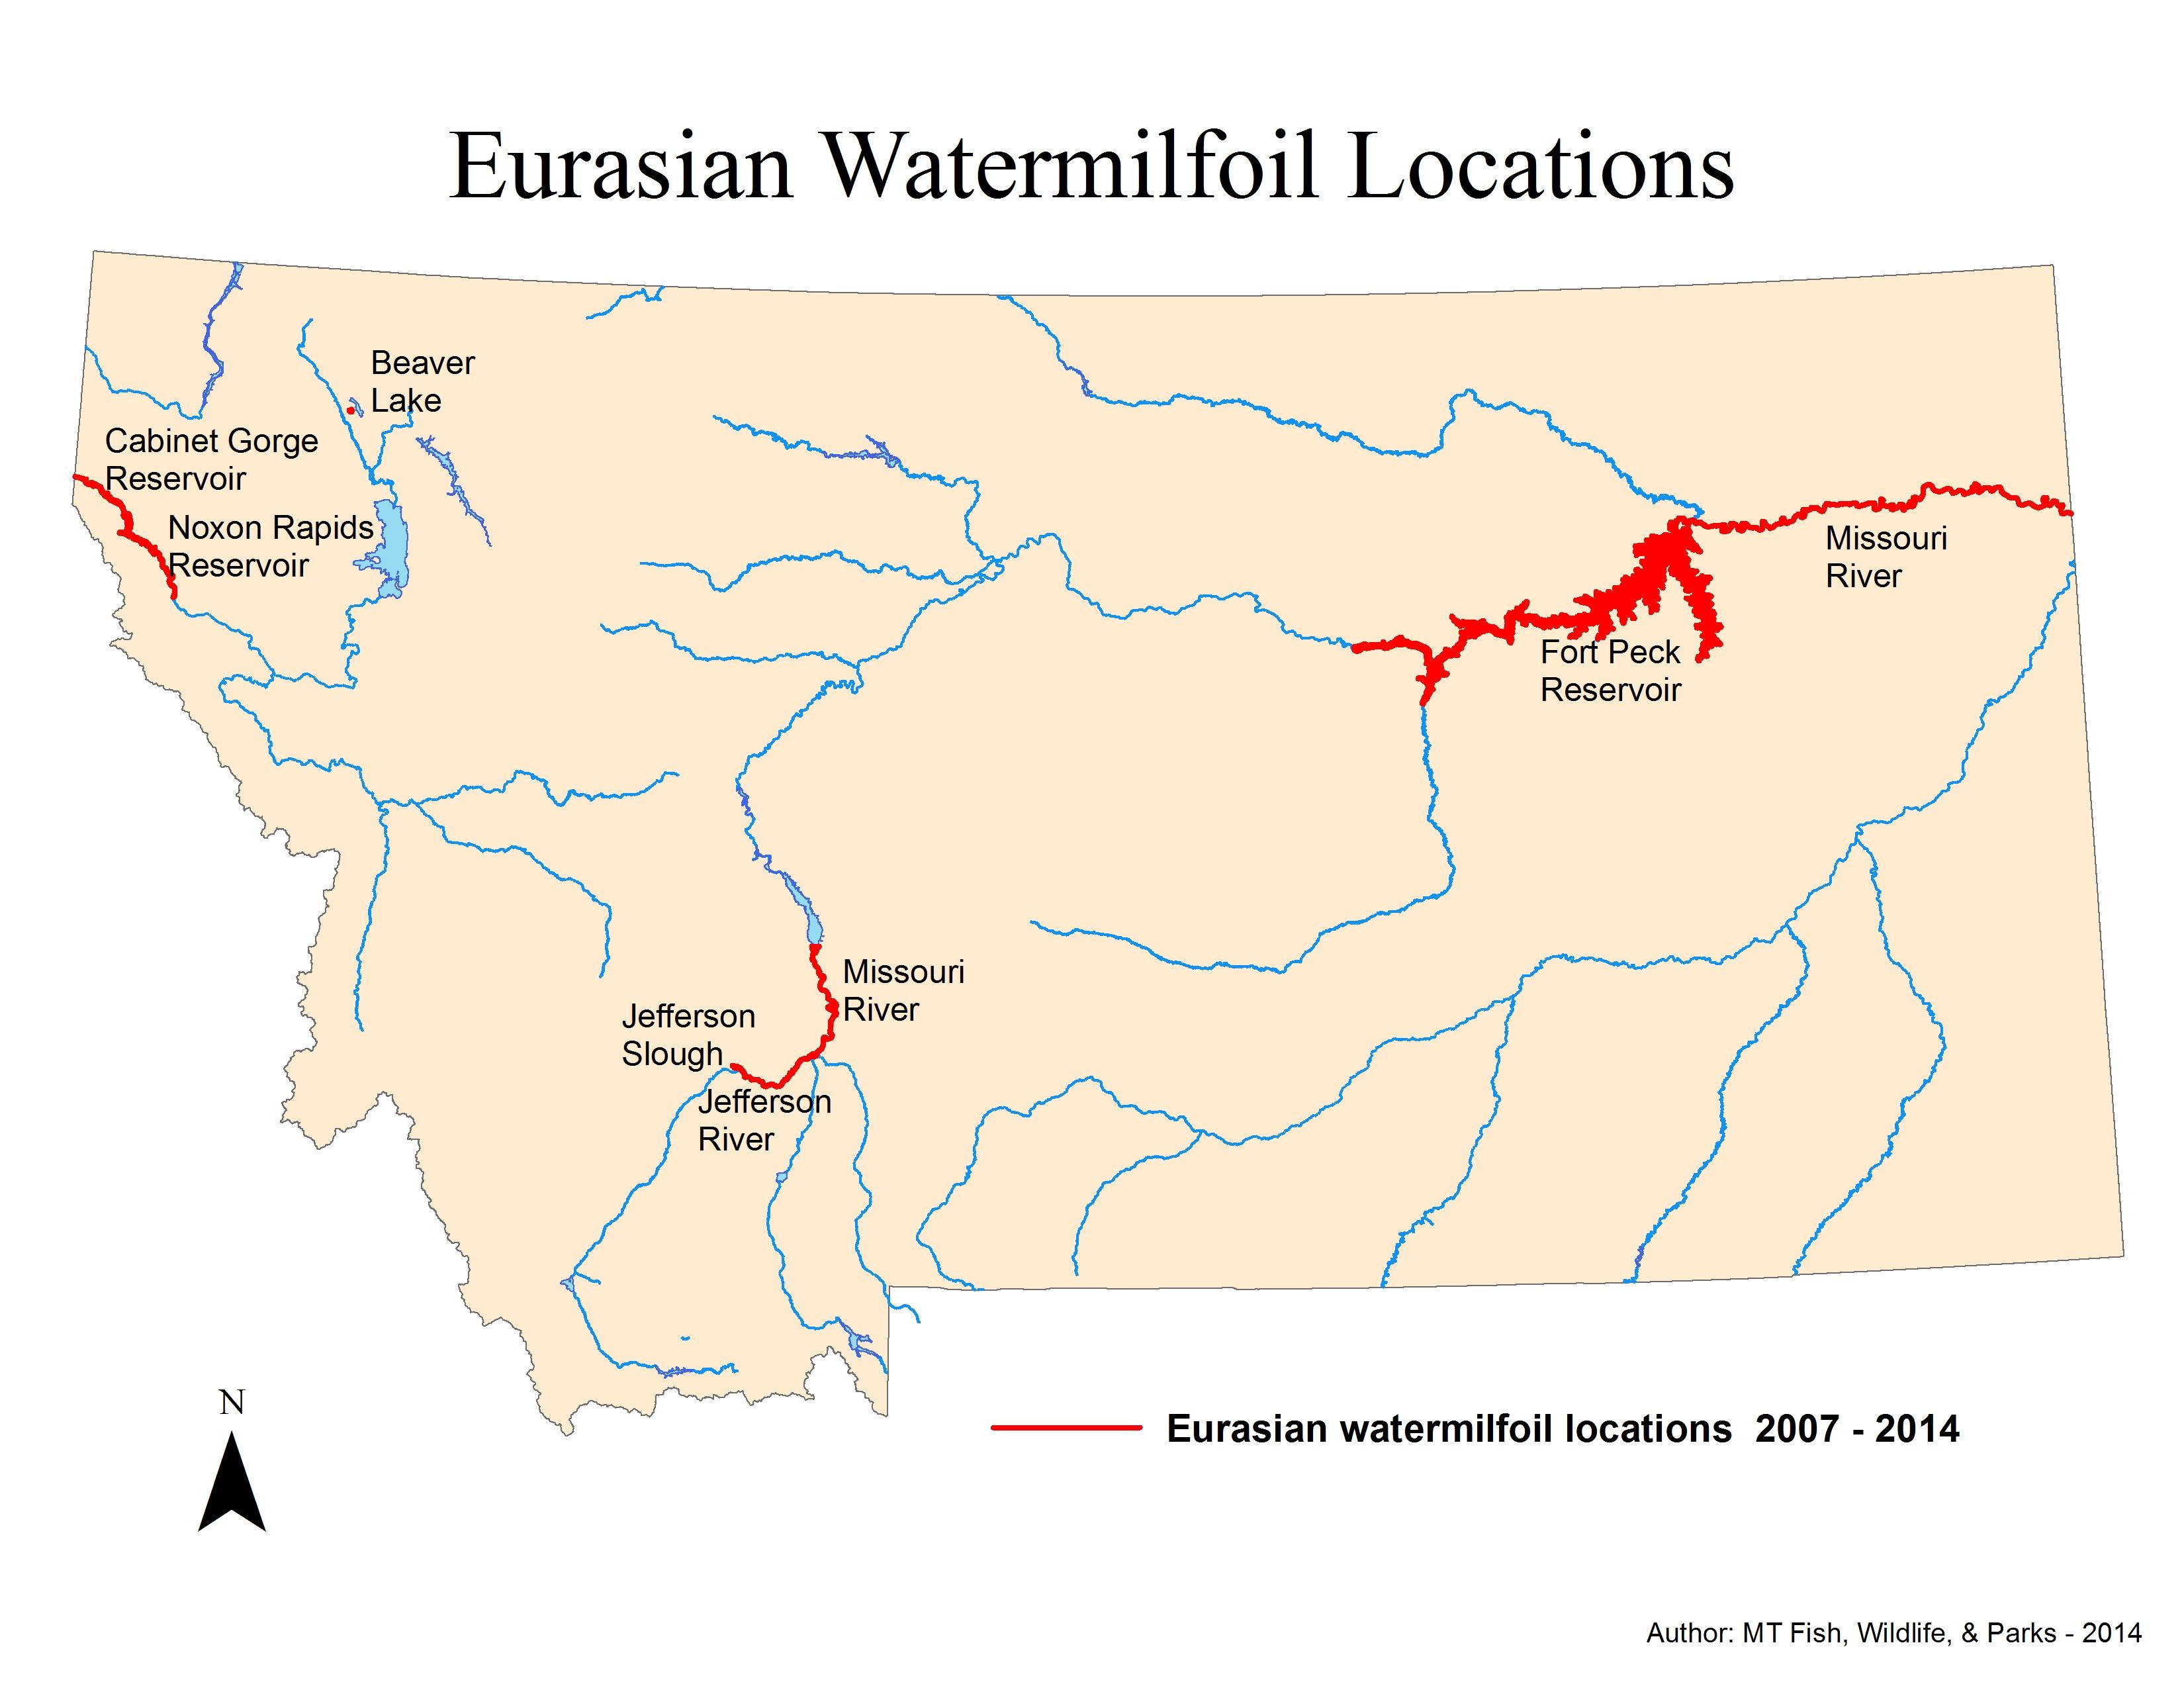 Montana mccone county circle - Eurasianwatermilfoilmap Eurasianwatermilfoil